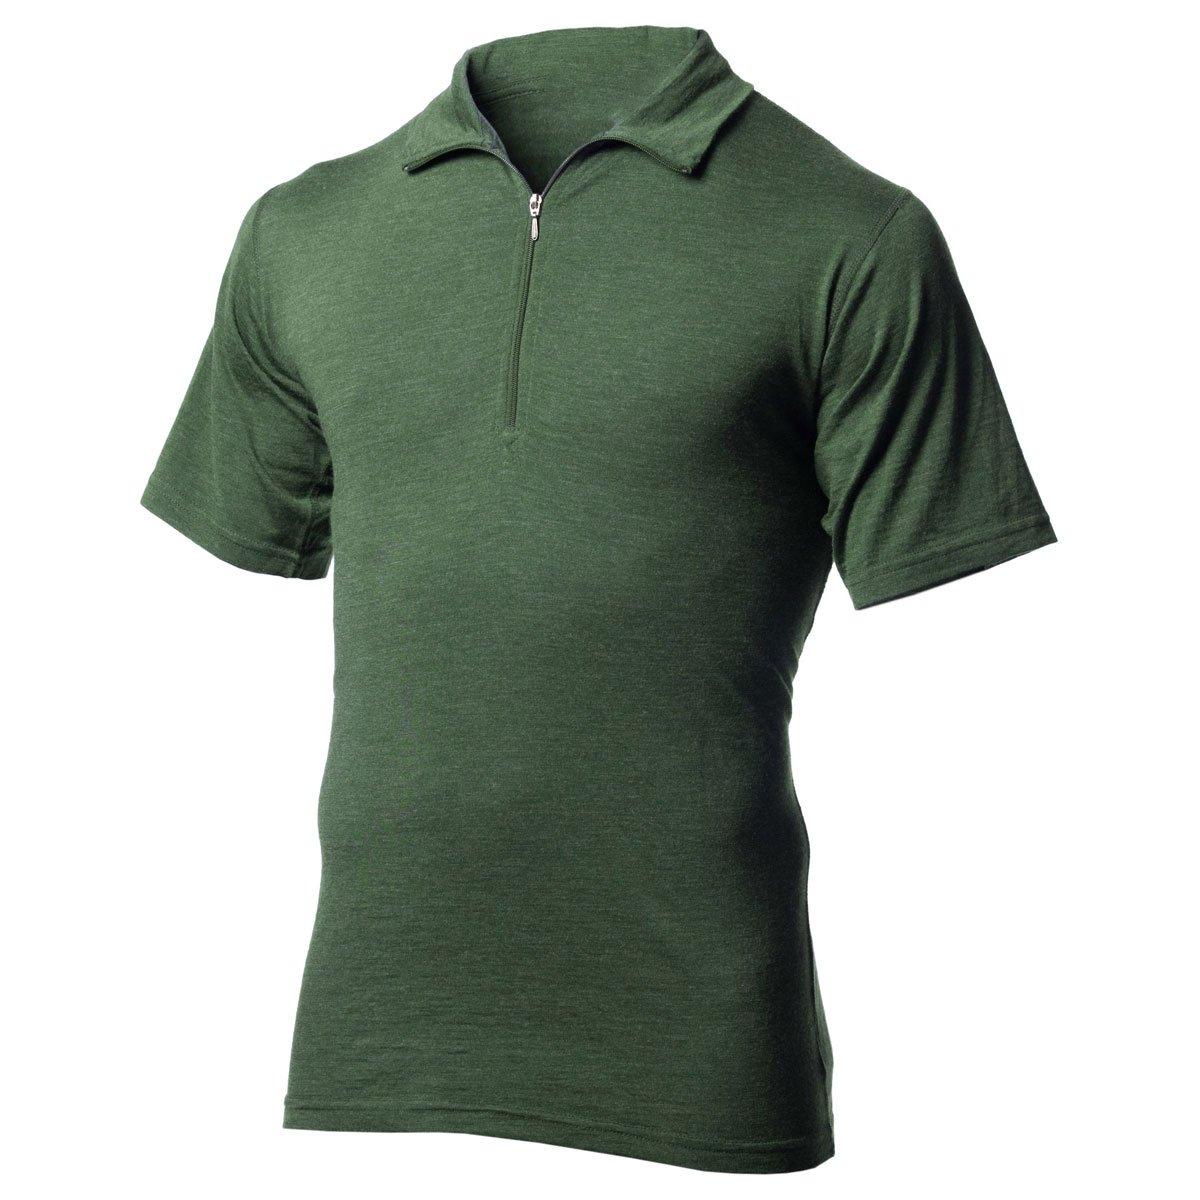 Minus33 Merino Wool Tarleton Lightweight Short Sleeve 1//4 Zip